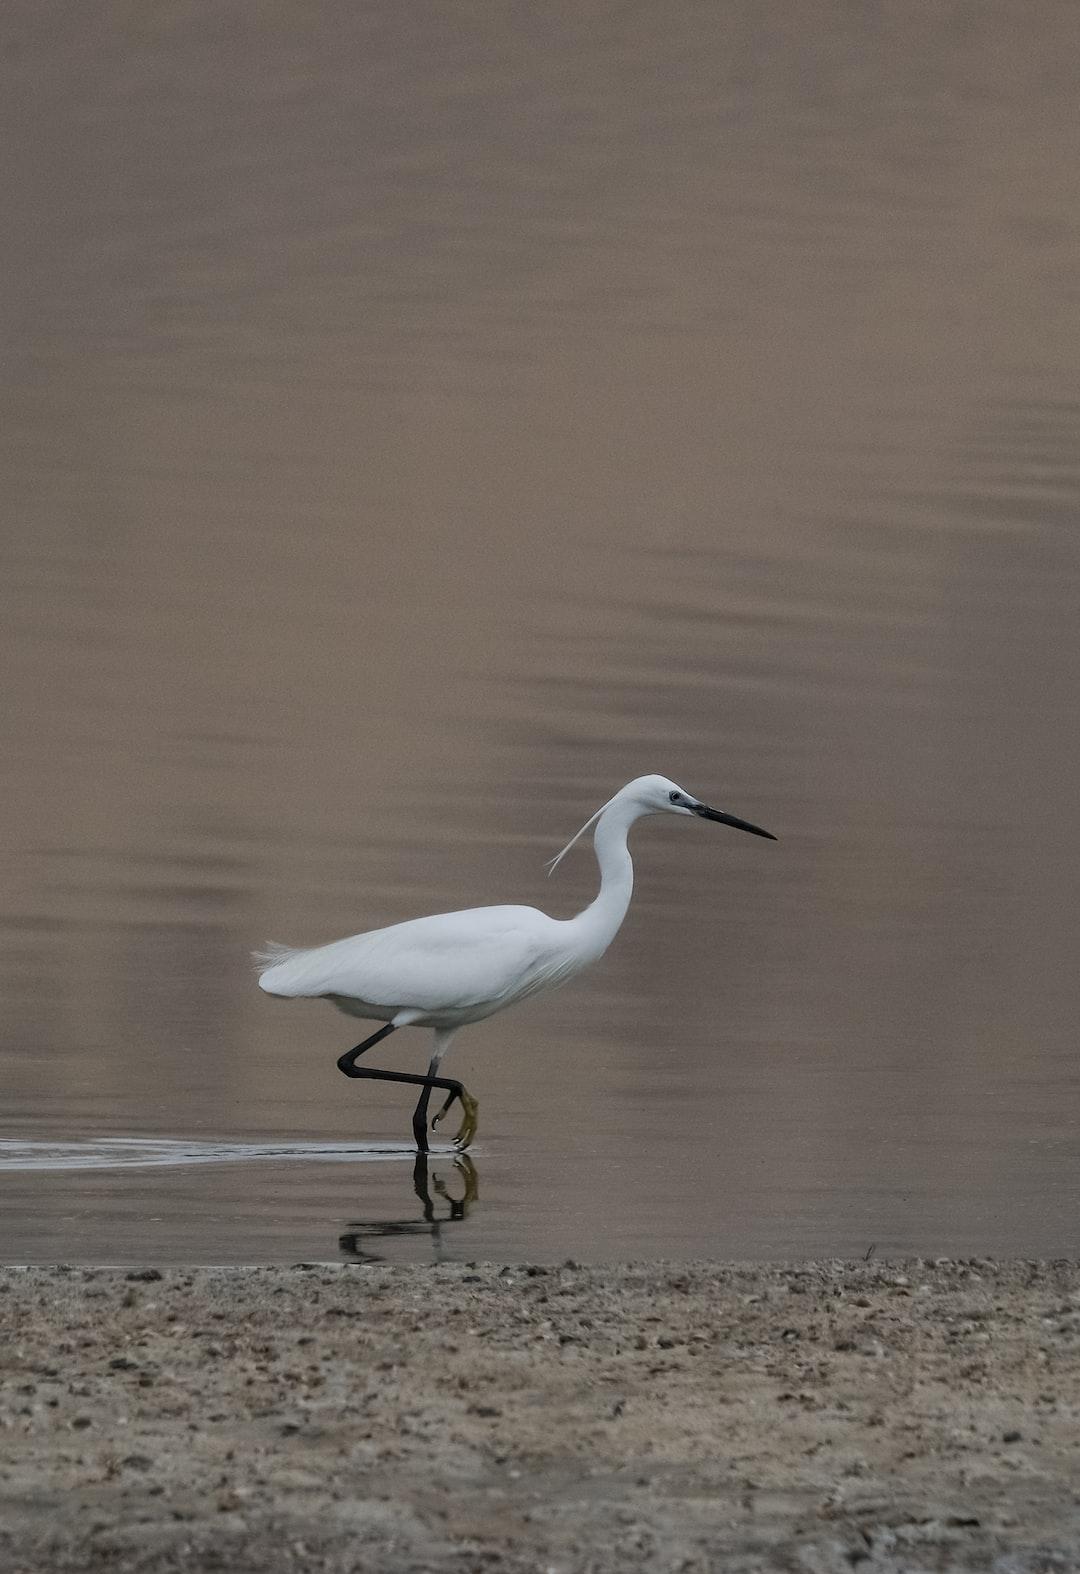 The Little Egret